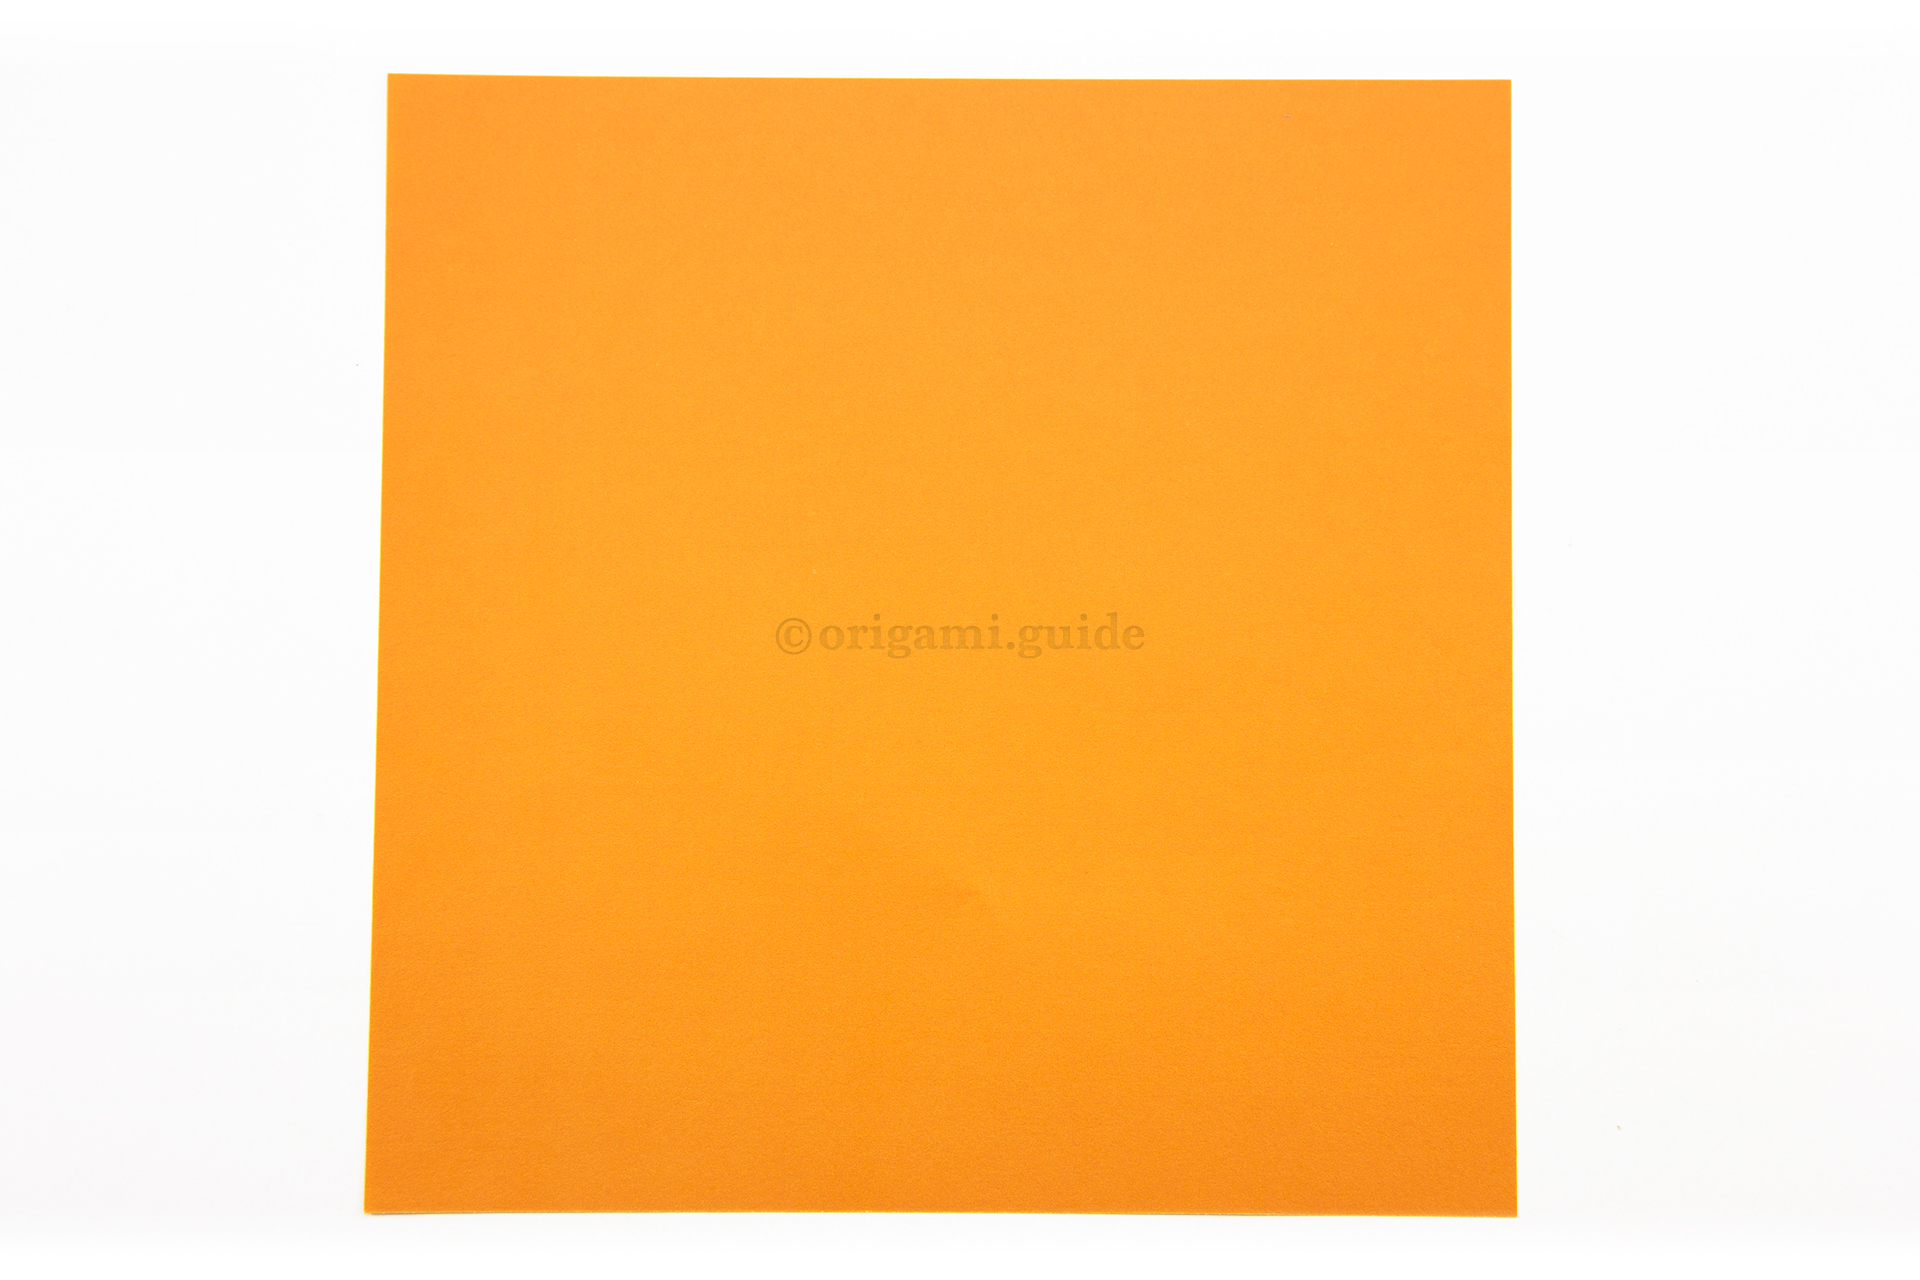 Origami Star (Four-Pointed Spiral) Tutorial (Hyo Ahn) | Stelle | 1280x1920